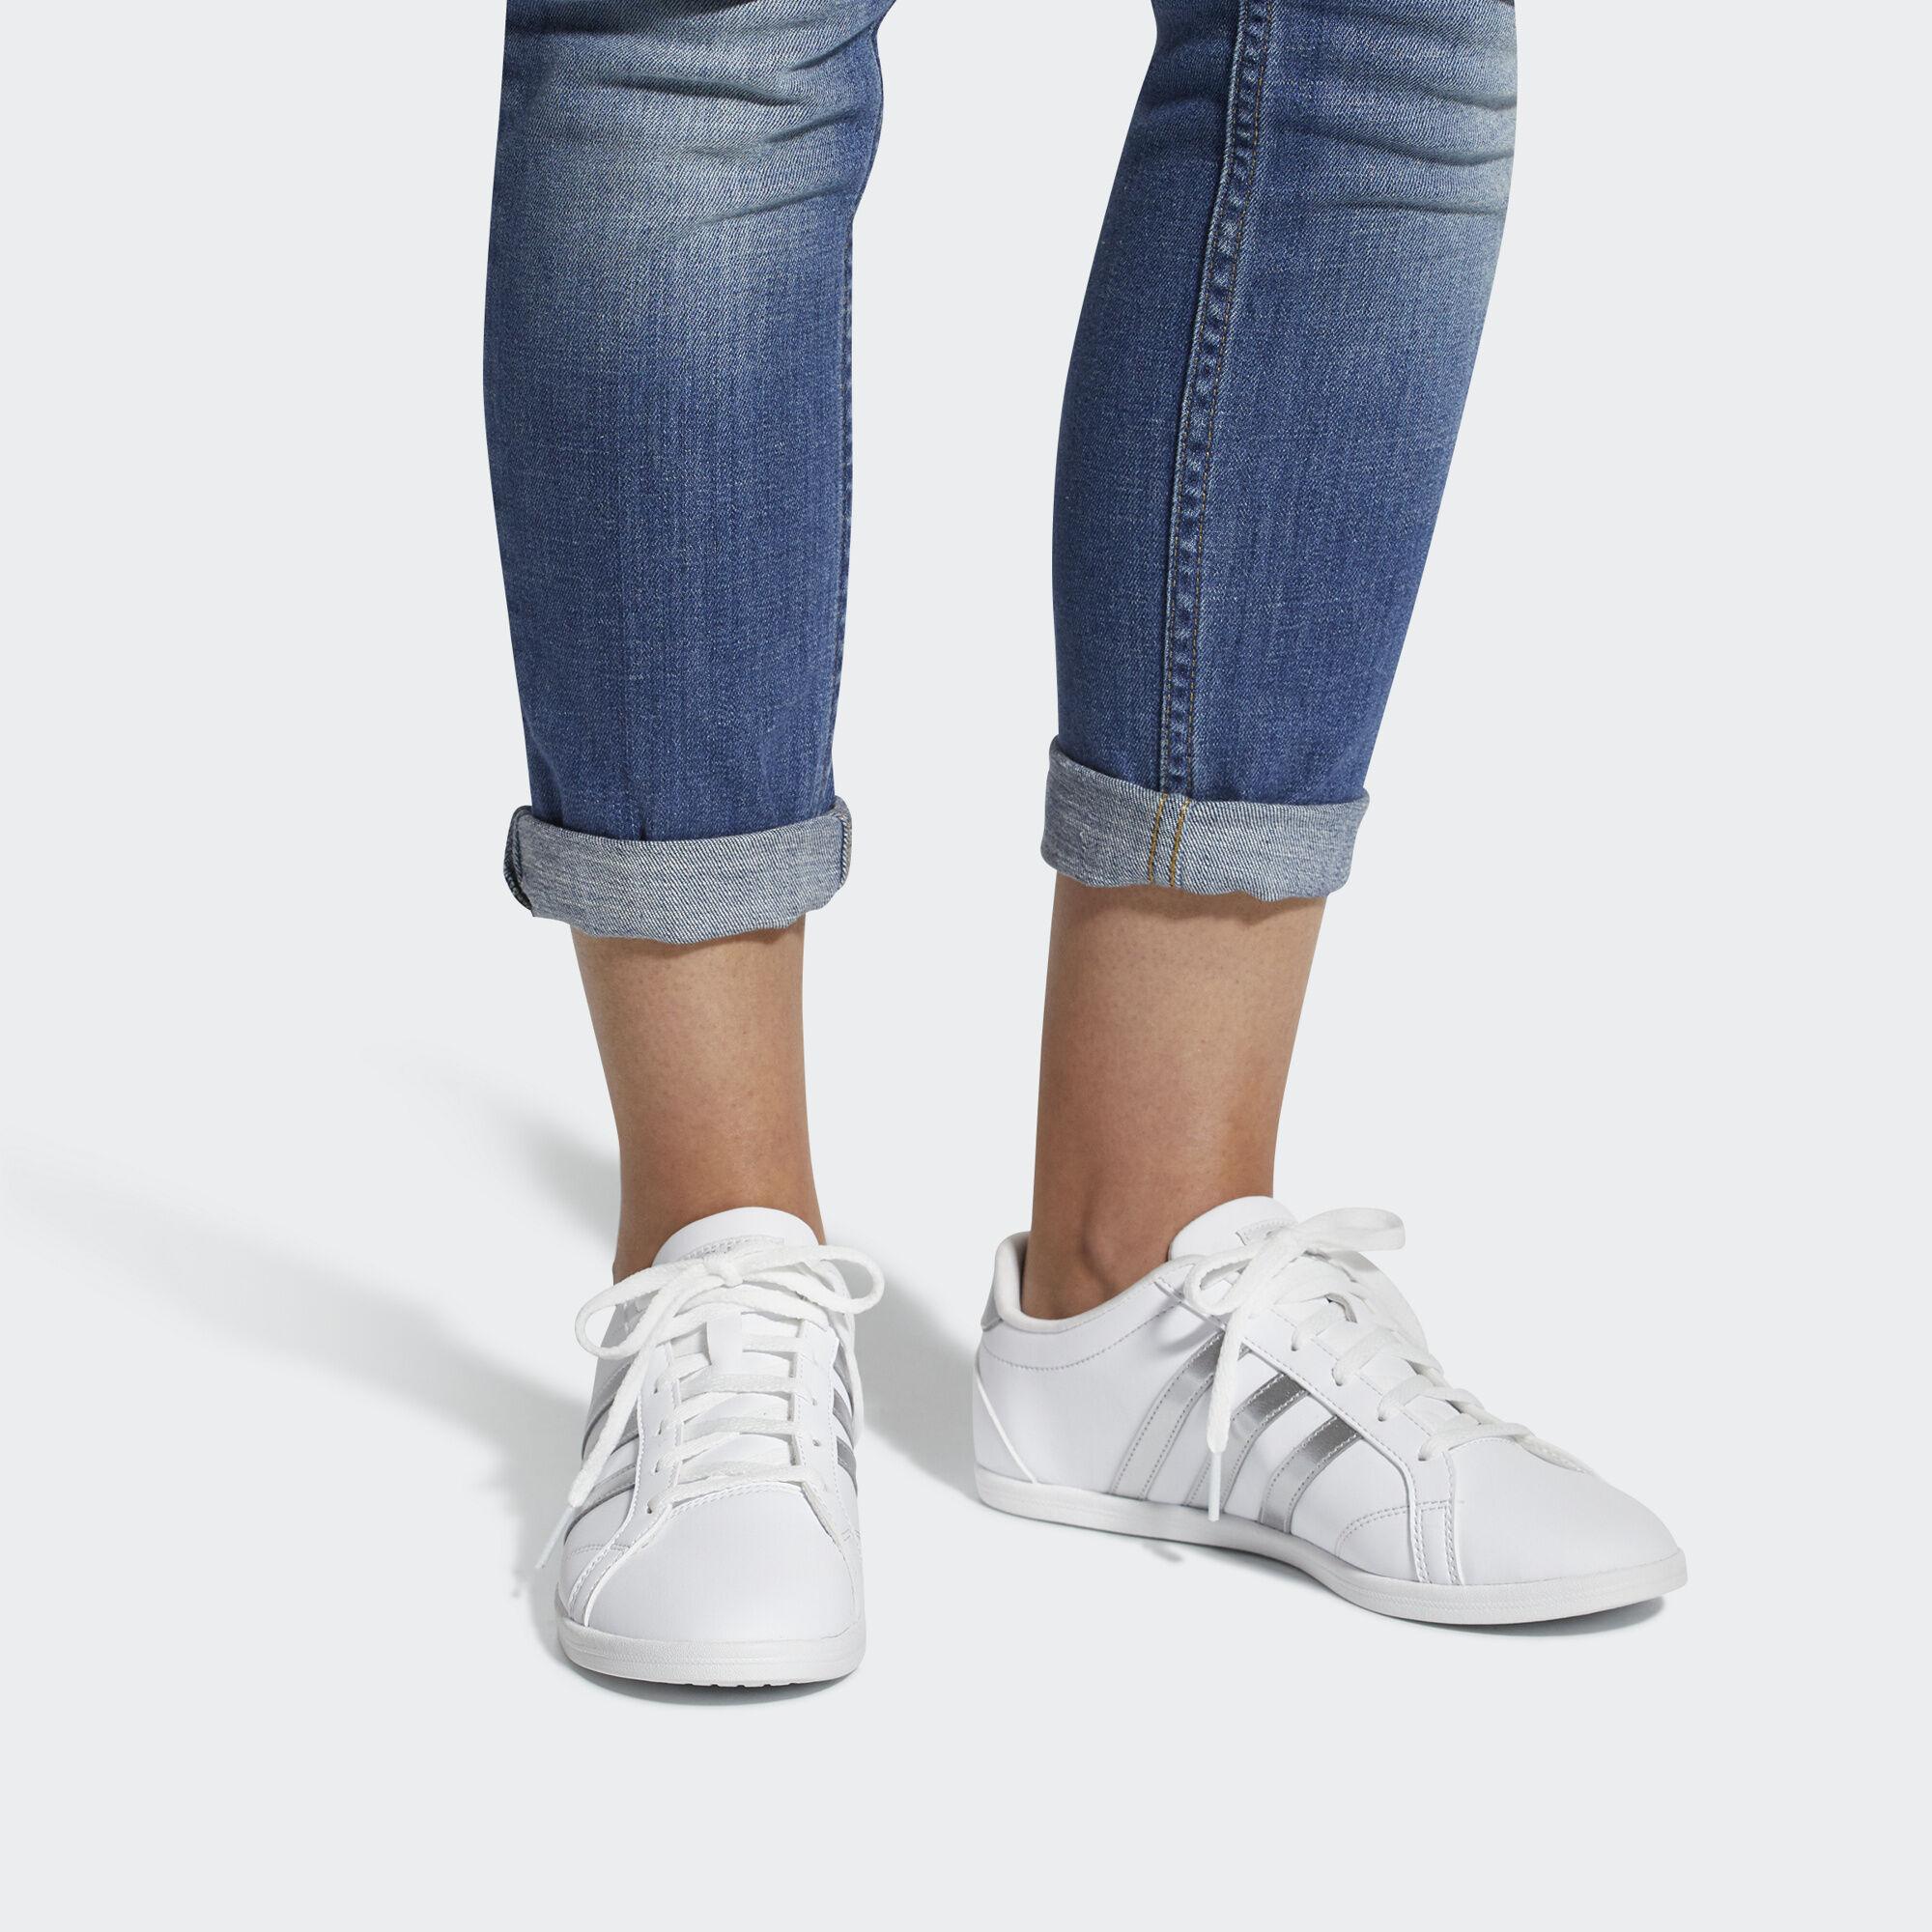 adidas Sapatos VS CONEO QT - Branco  7527bed637f87